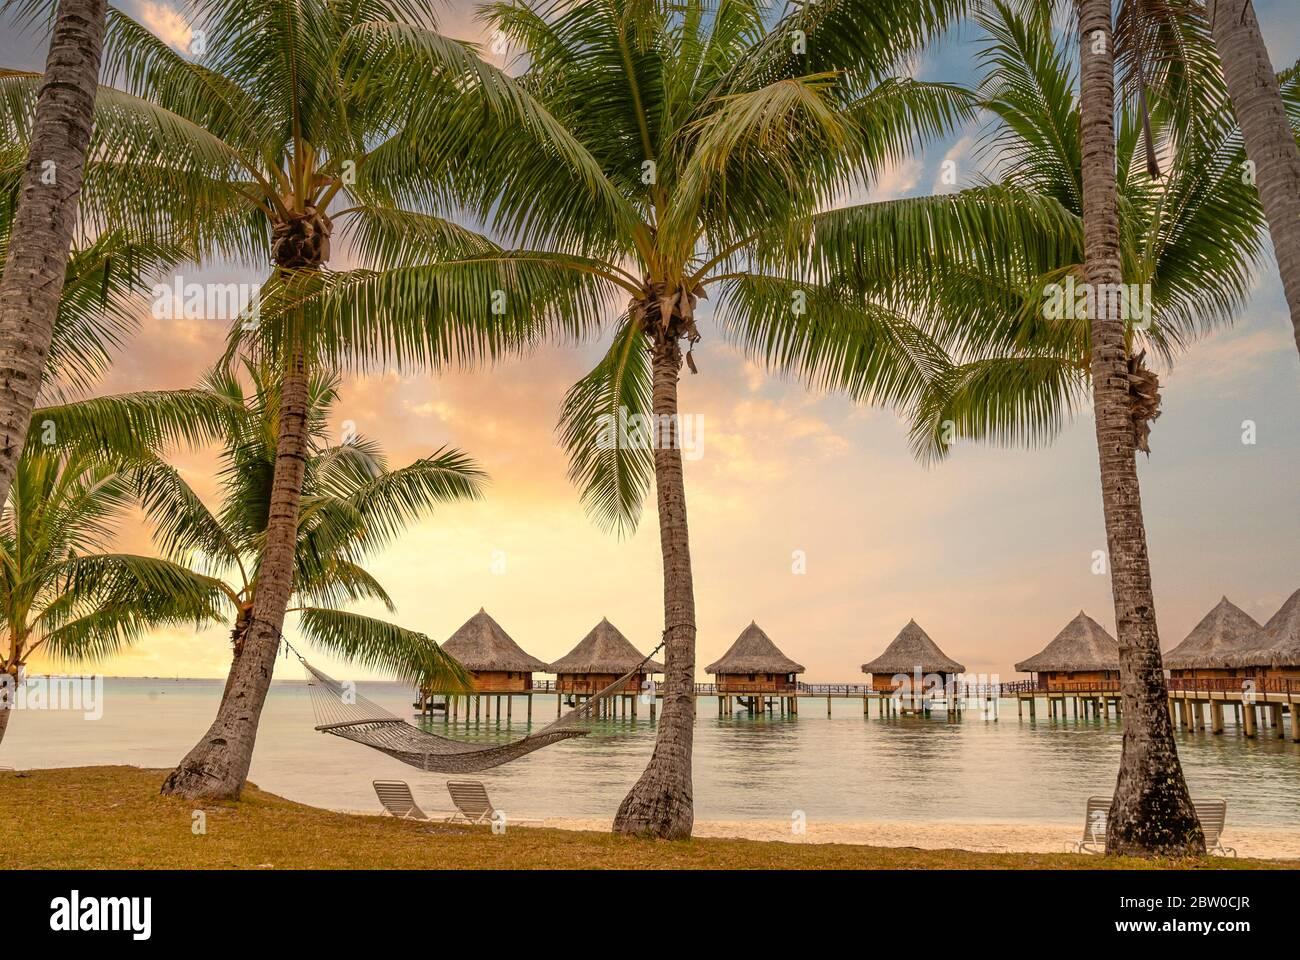 Beach resort at a lagoon on Tuamotu Island at sunset, French Polynesia Stock Photo